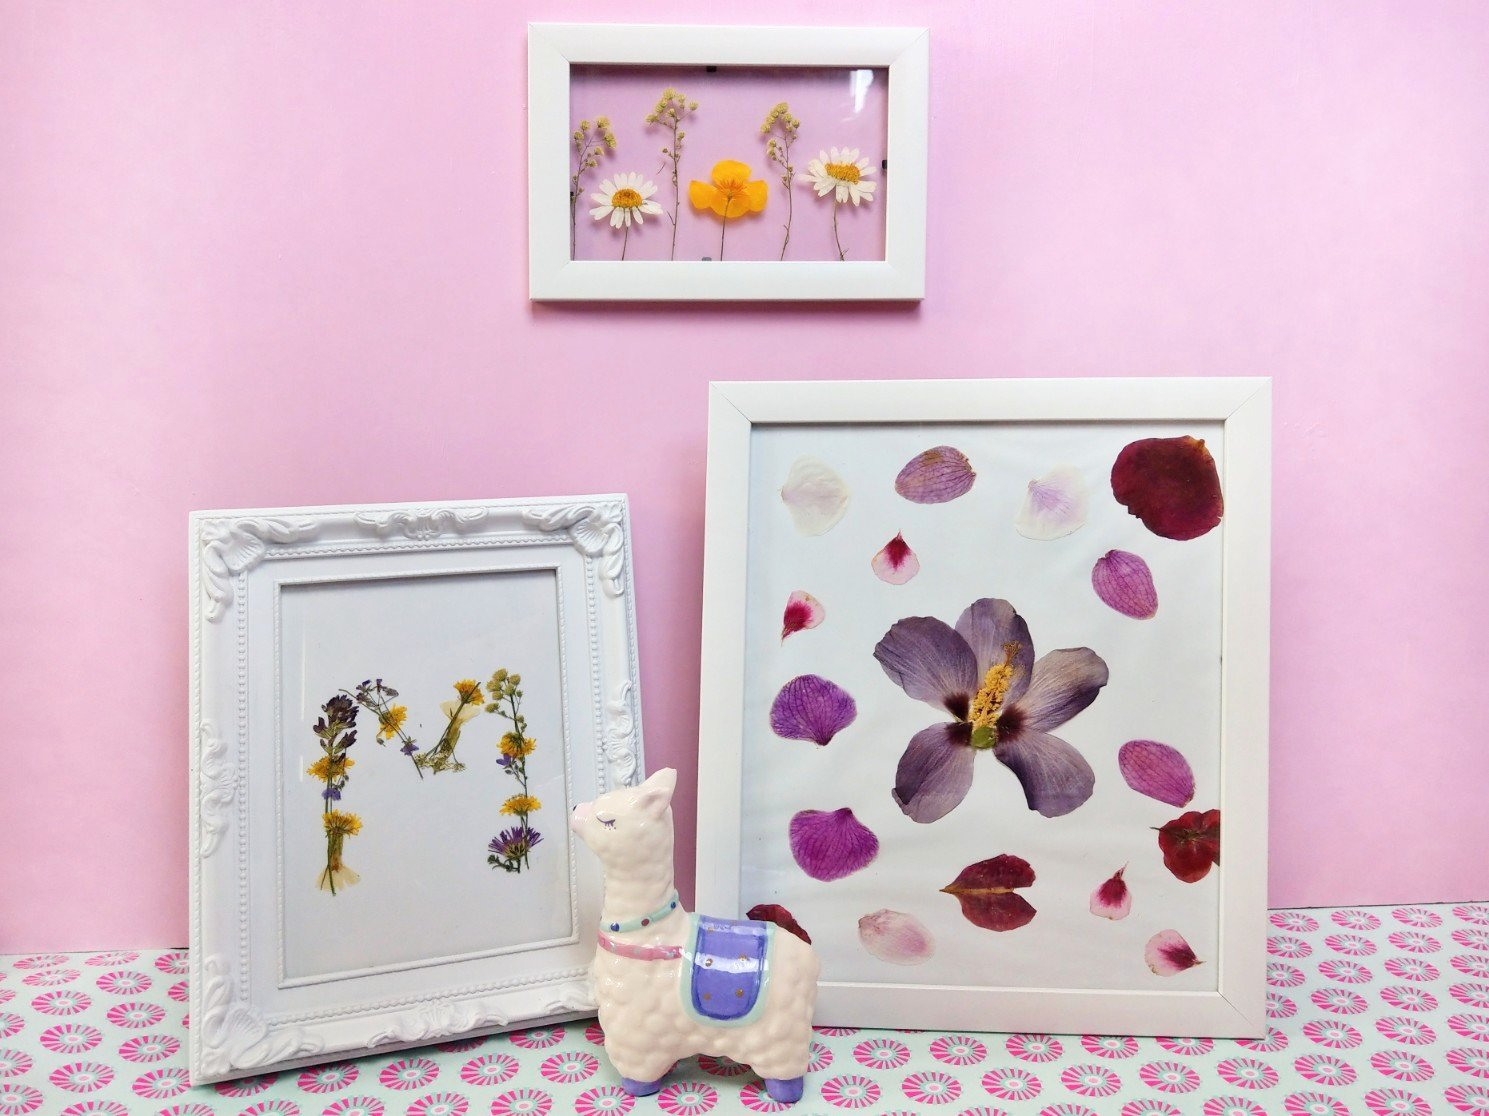 Drei Tolle Ideen Mit Getrockneten Blumen Deko Im Bilderrahmen